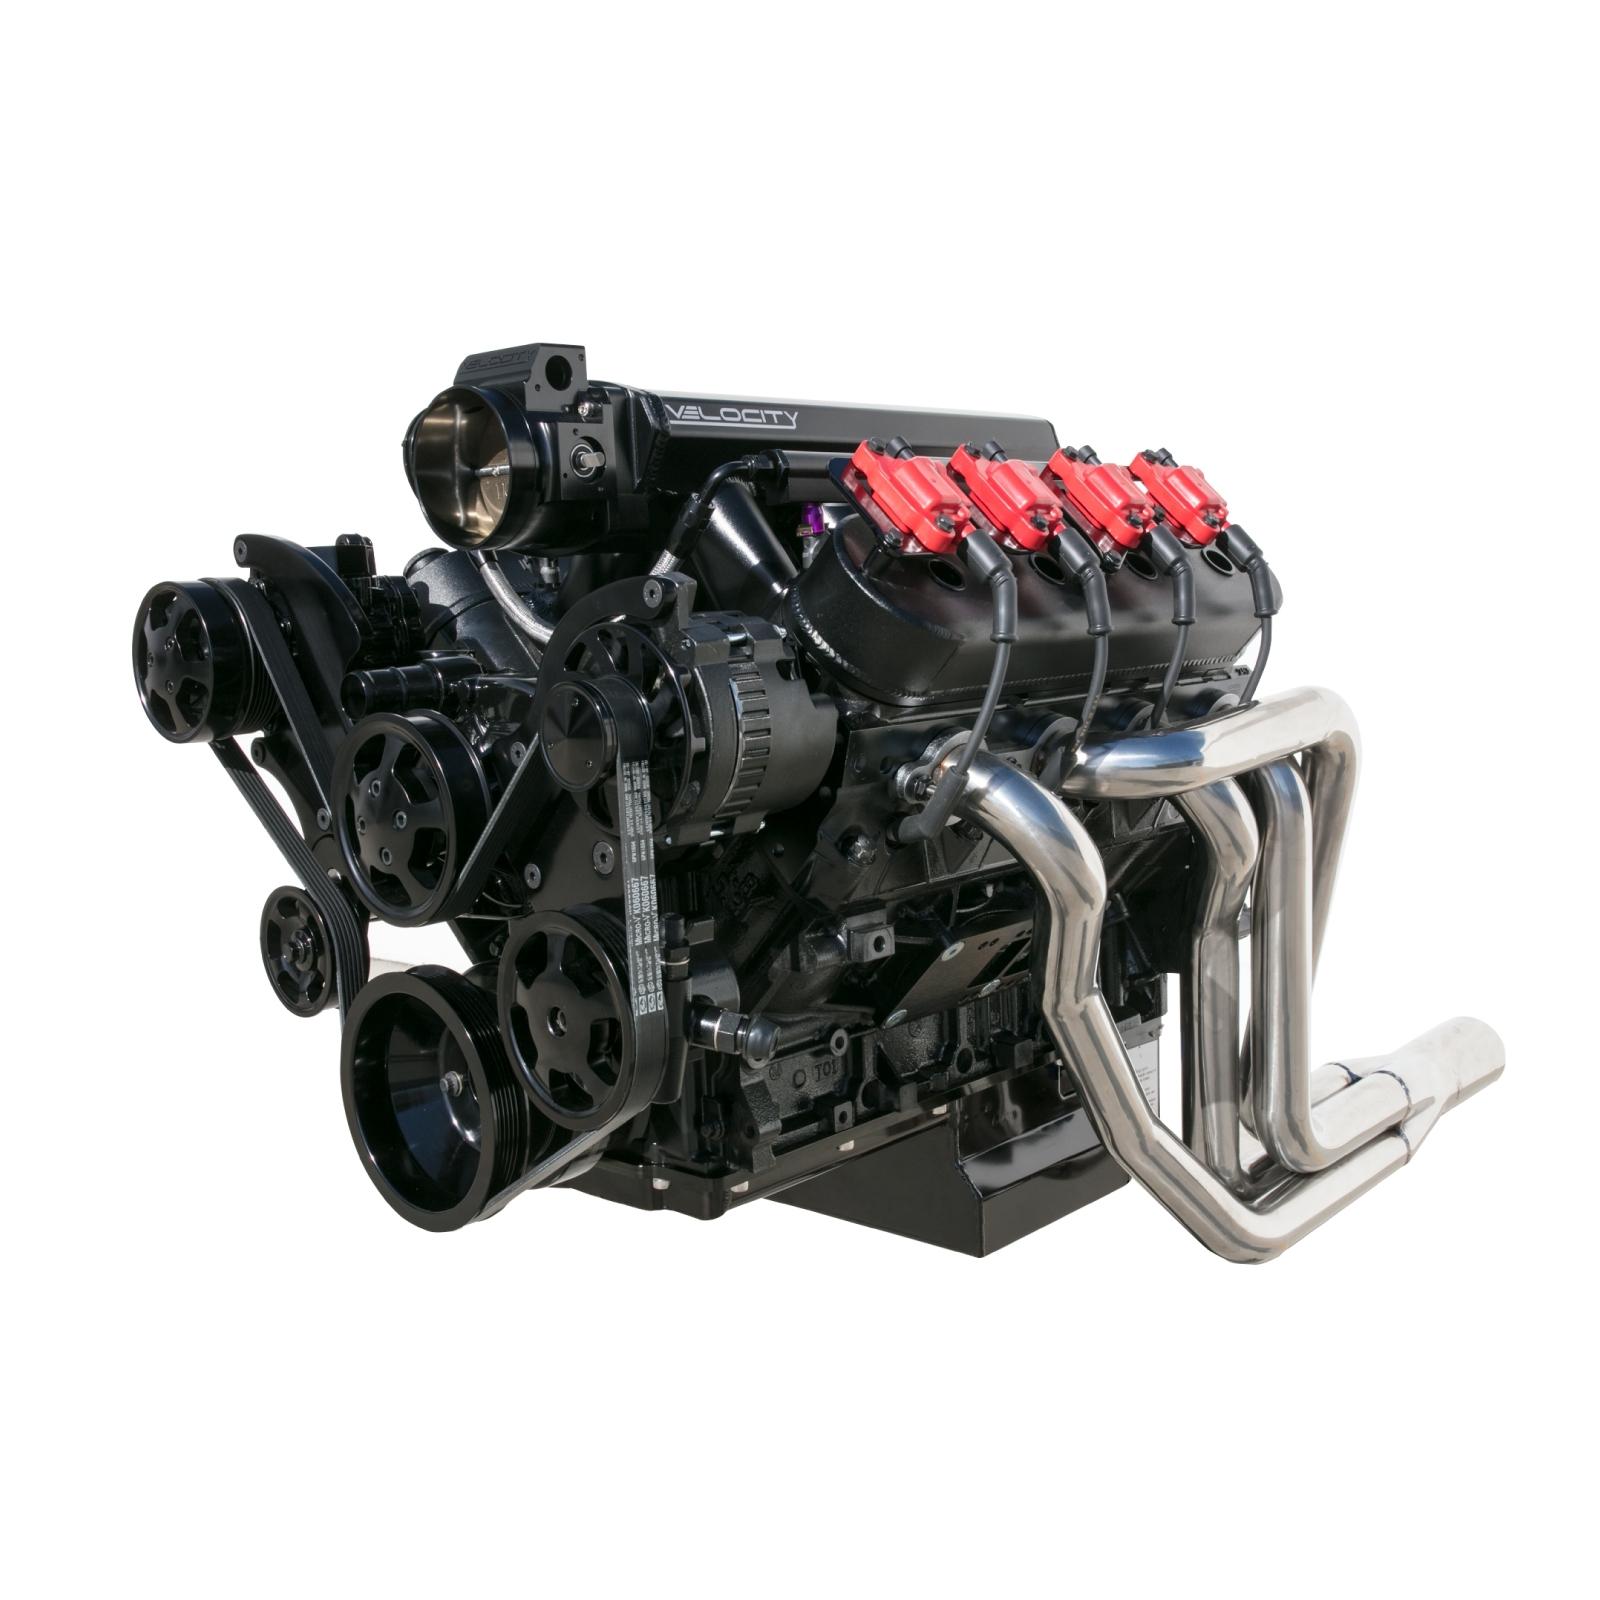 Ls6 Engine Horsepower: BLACK LS1 LS2 LS6 FRONT DRIVE SERPENTINE PULLEY KIT GM